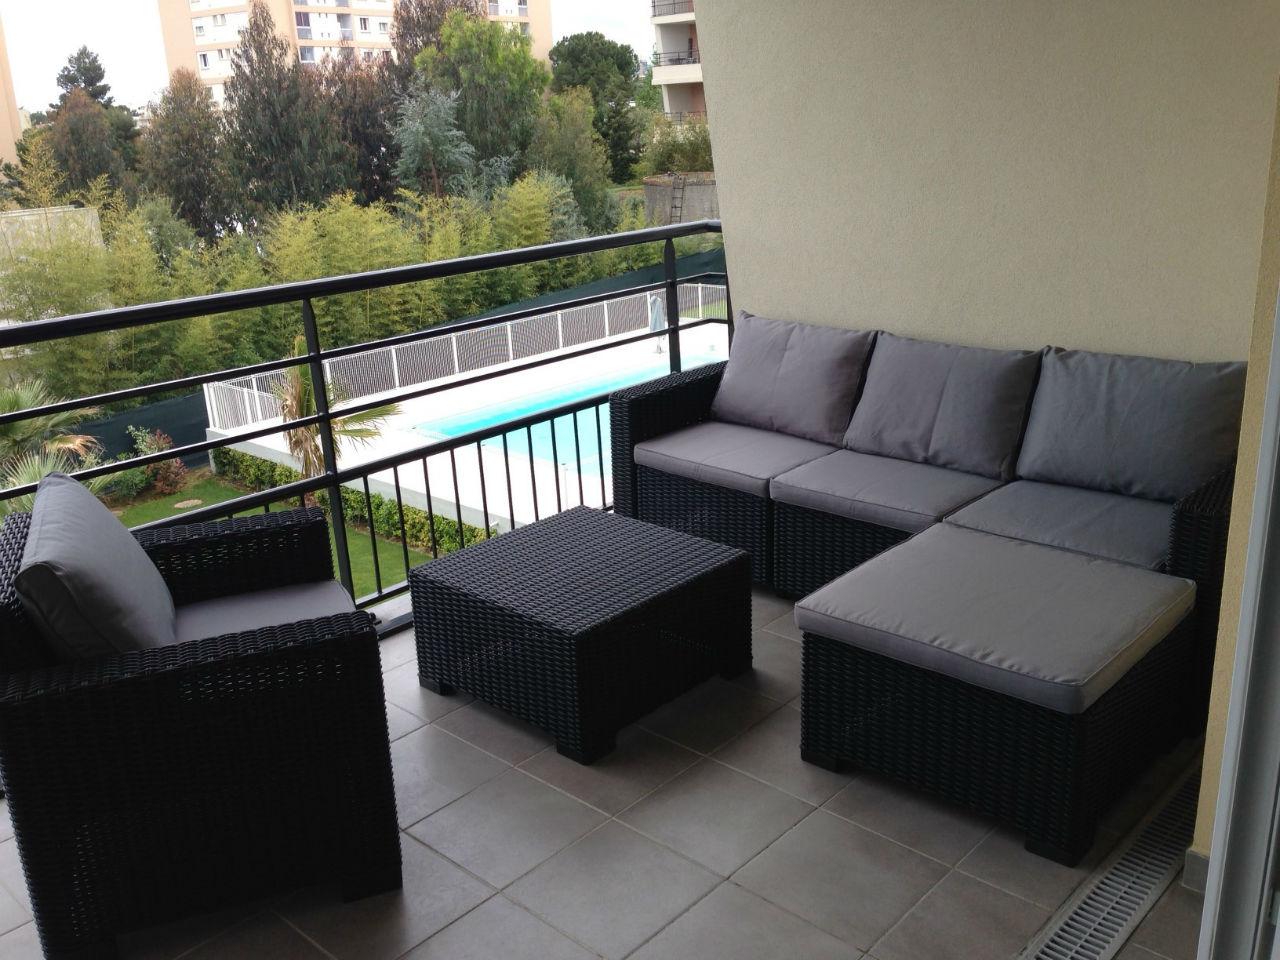 Salon de jardin pour balcon cdiscount - Mailleraye.fr jardin